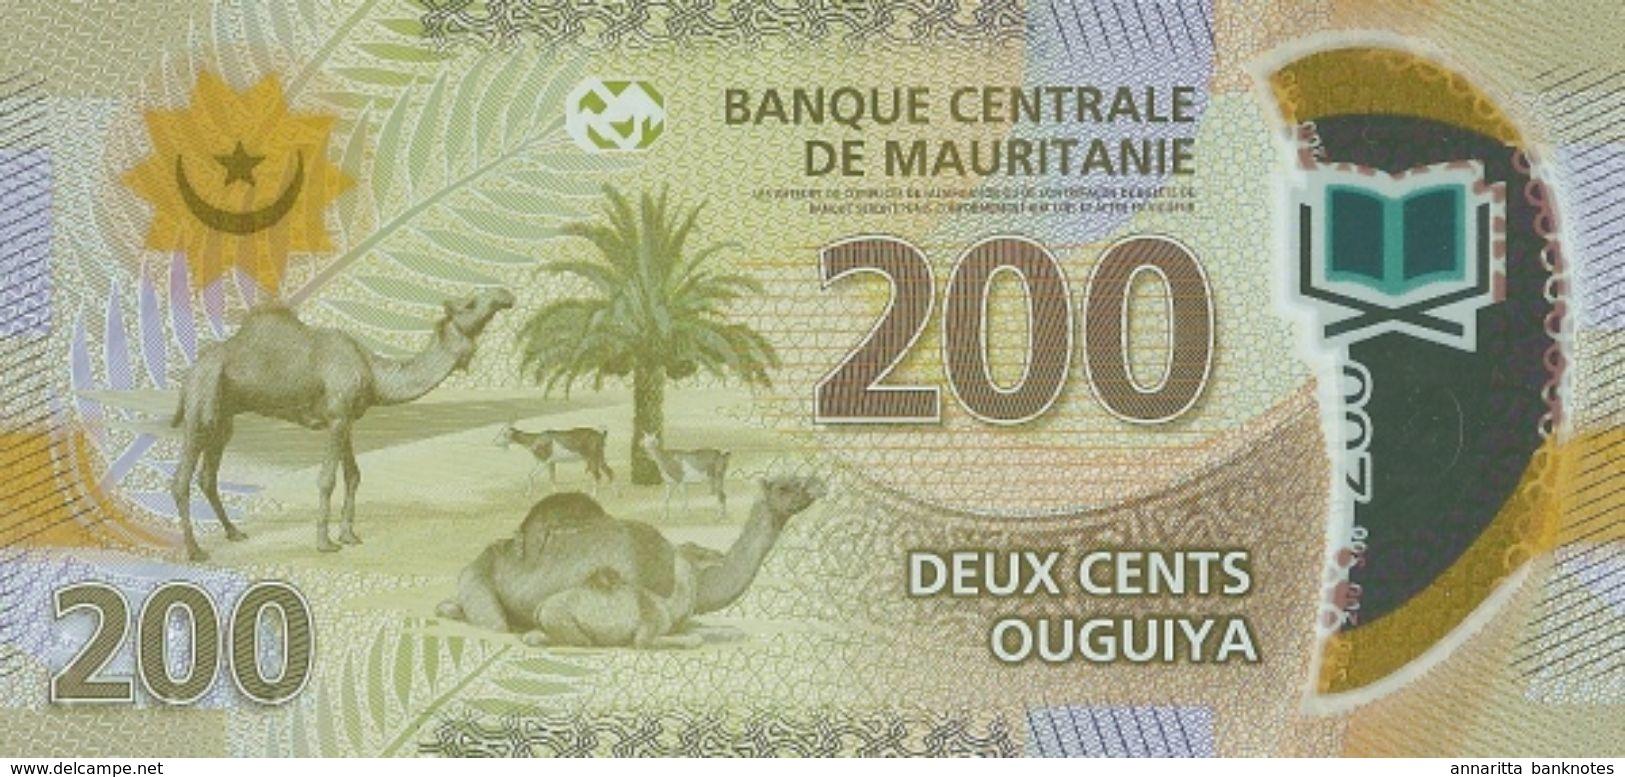 MAURITANIA 200 OUGUIYA 2017 P-24a UNC  [MR128a] - Mauritania